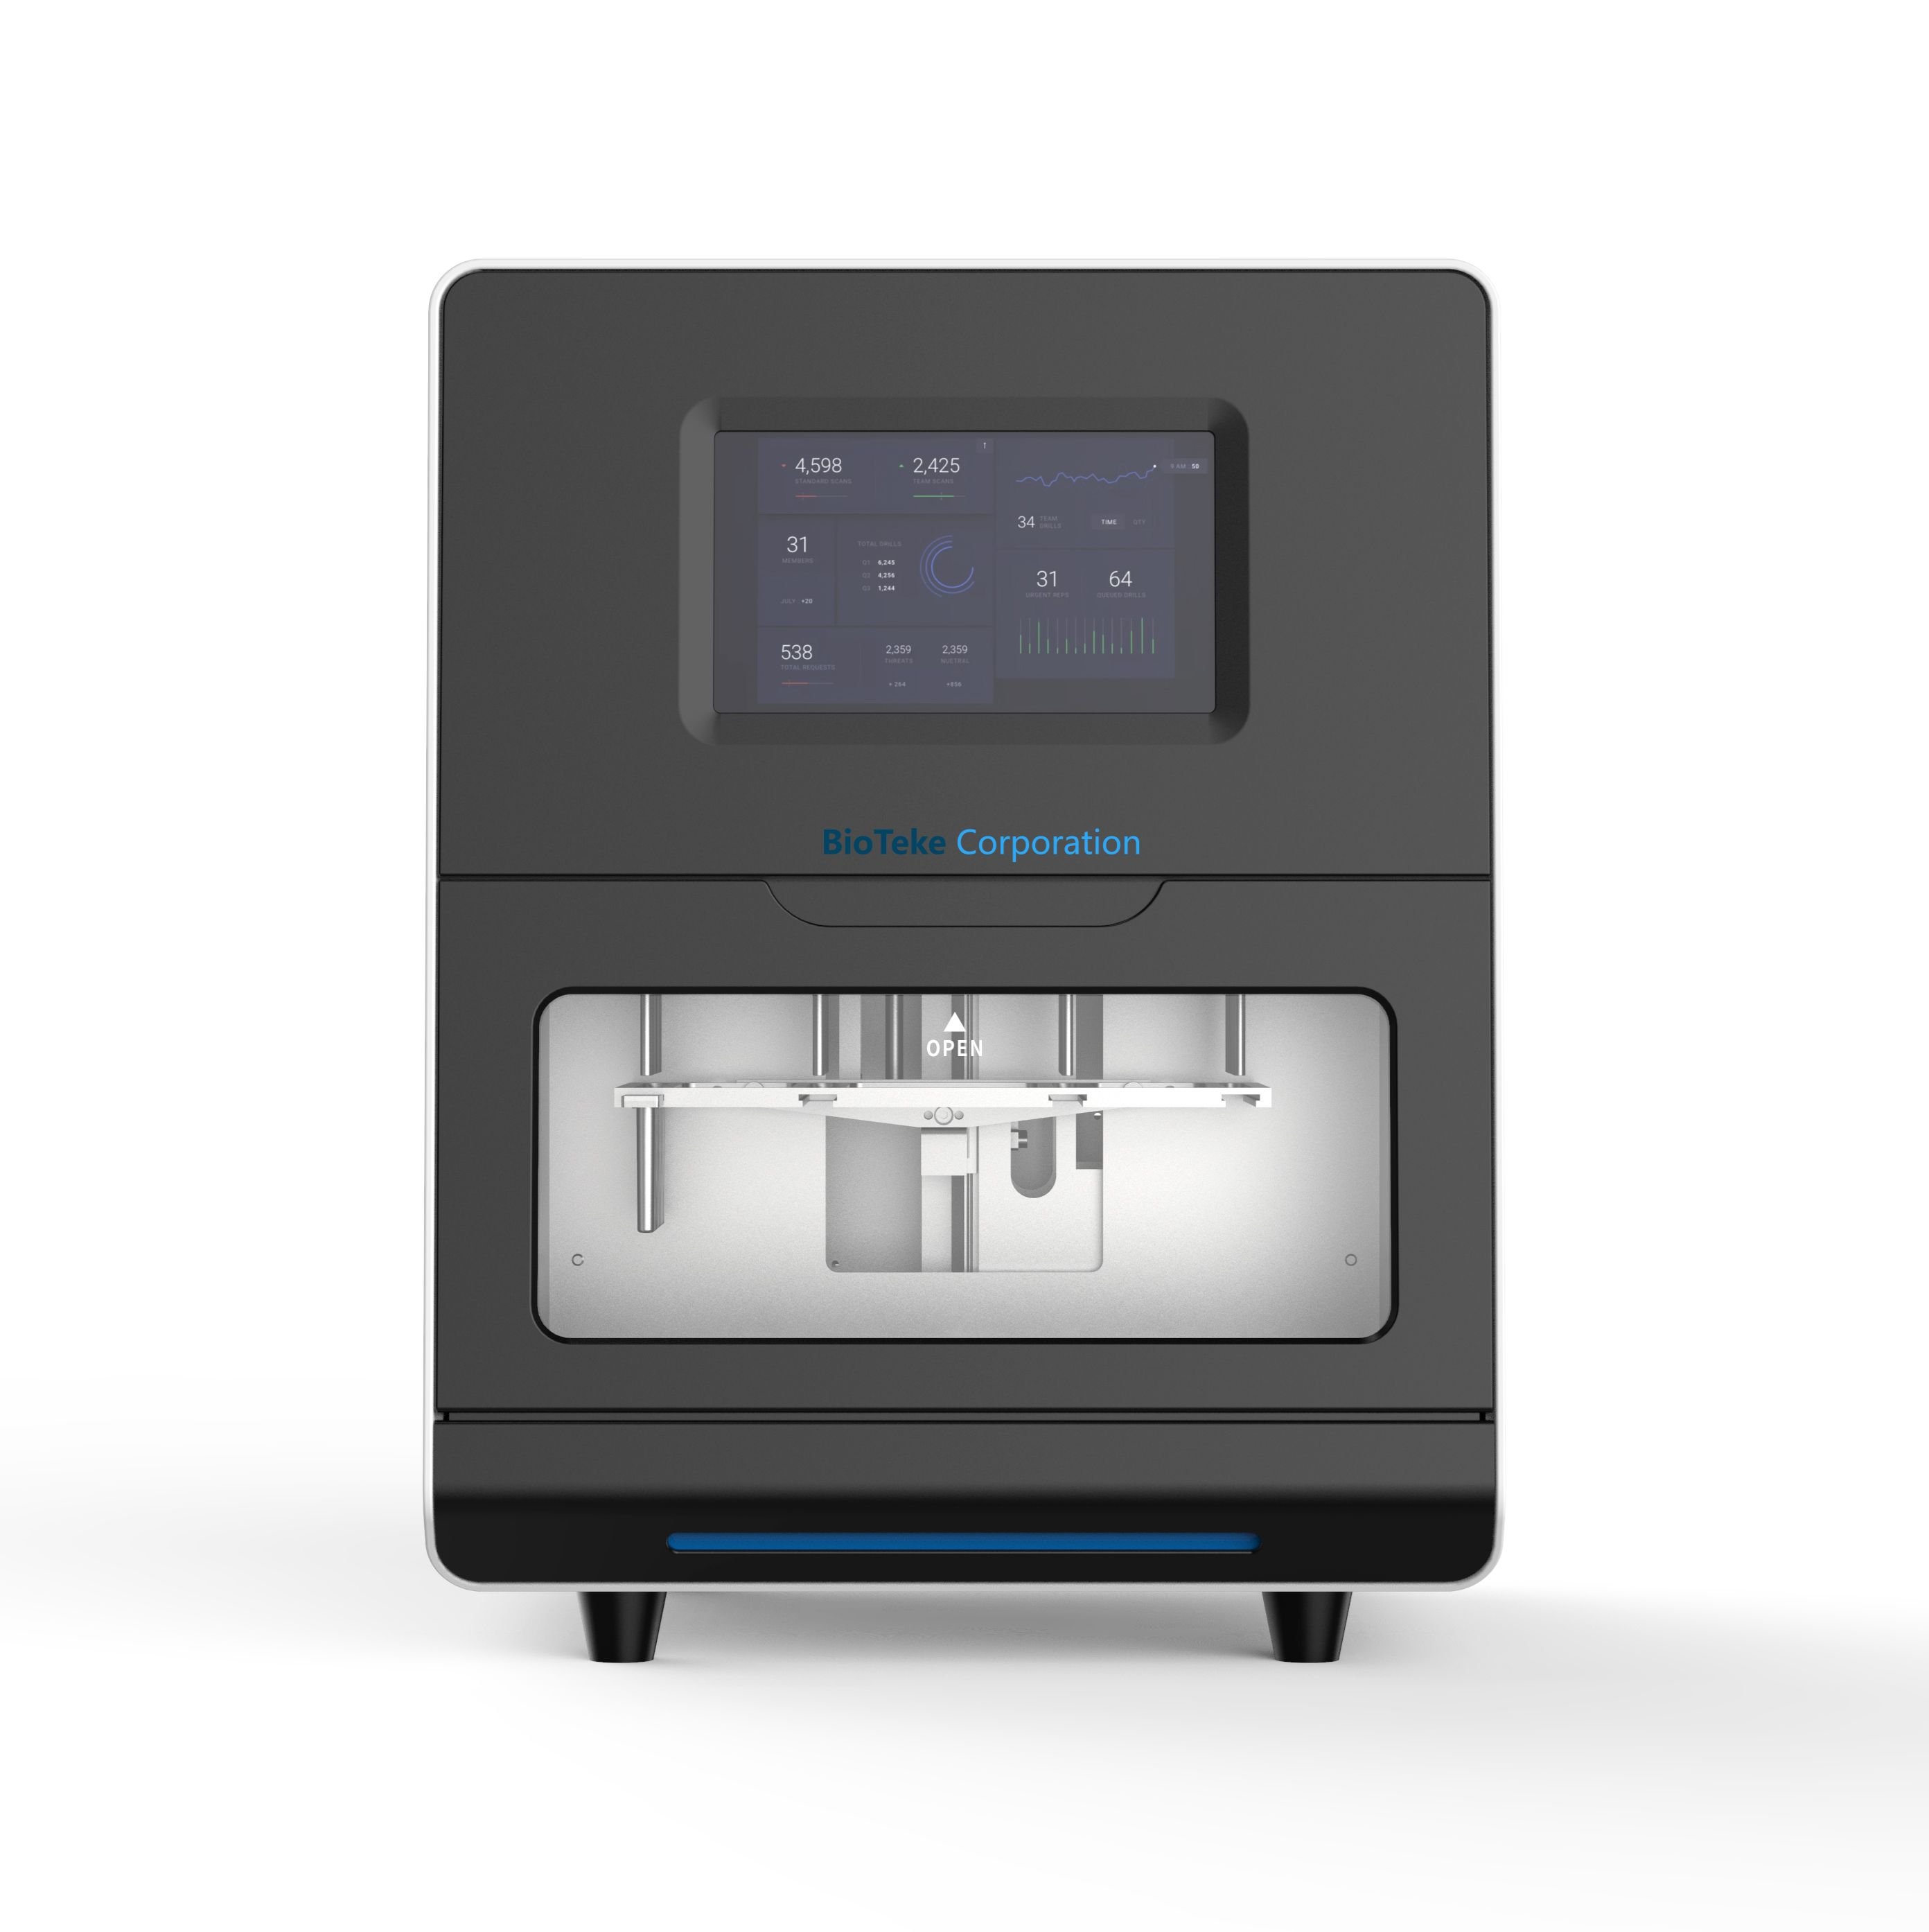 32通量核酸提取仪医用实验室核酸检测仪